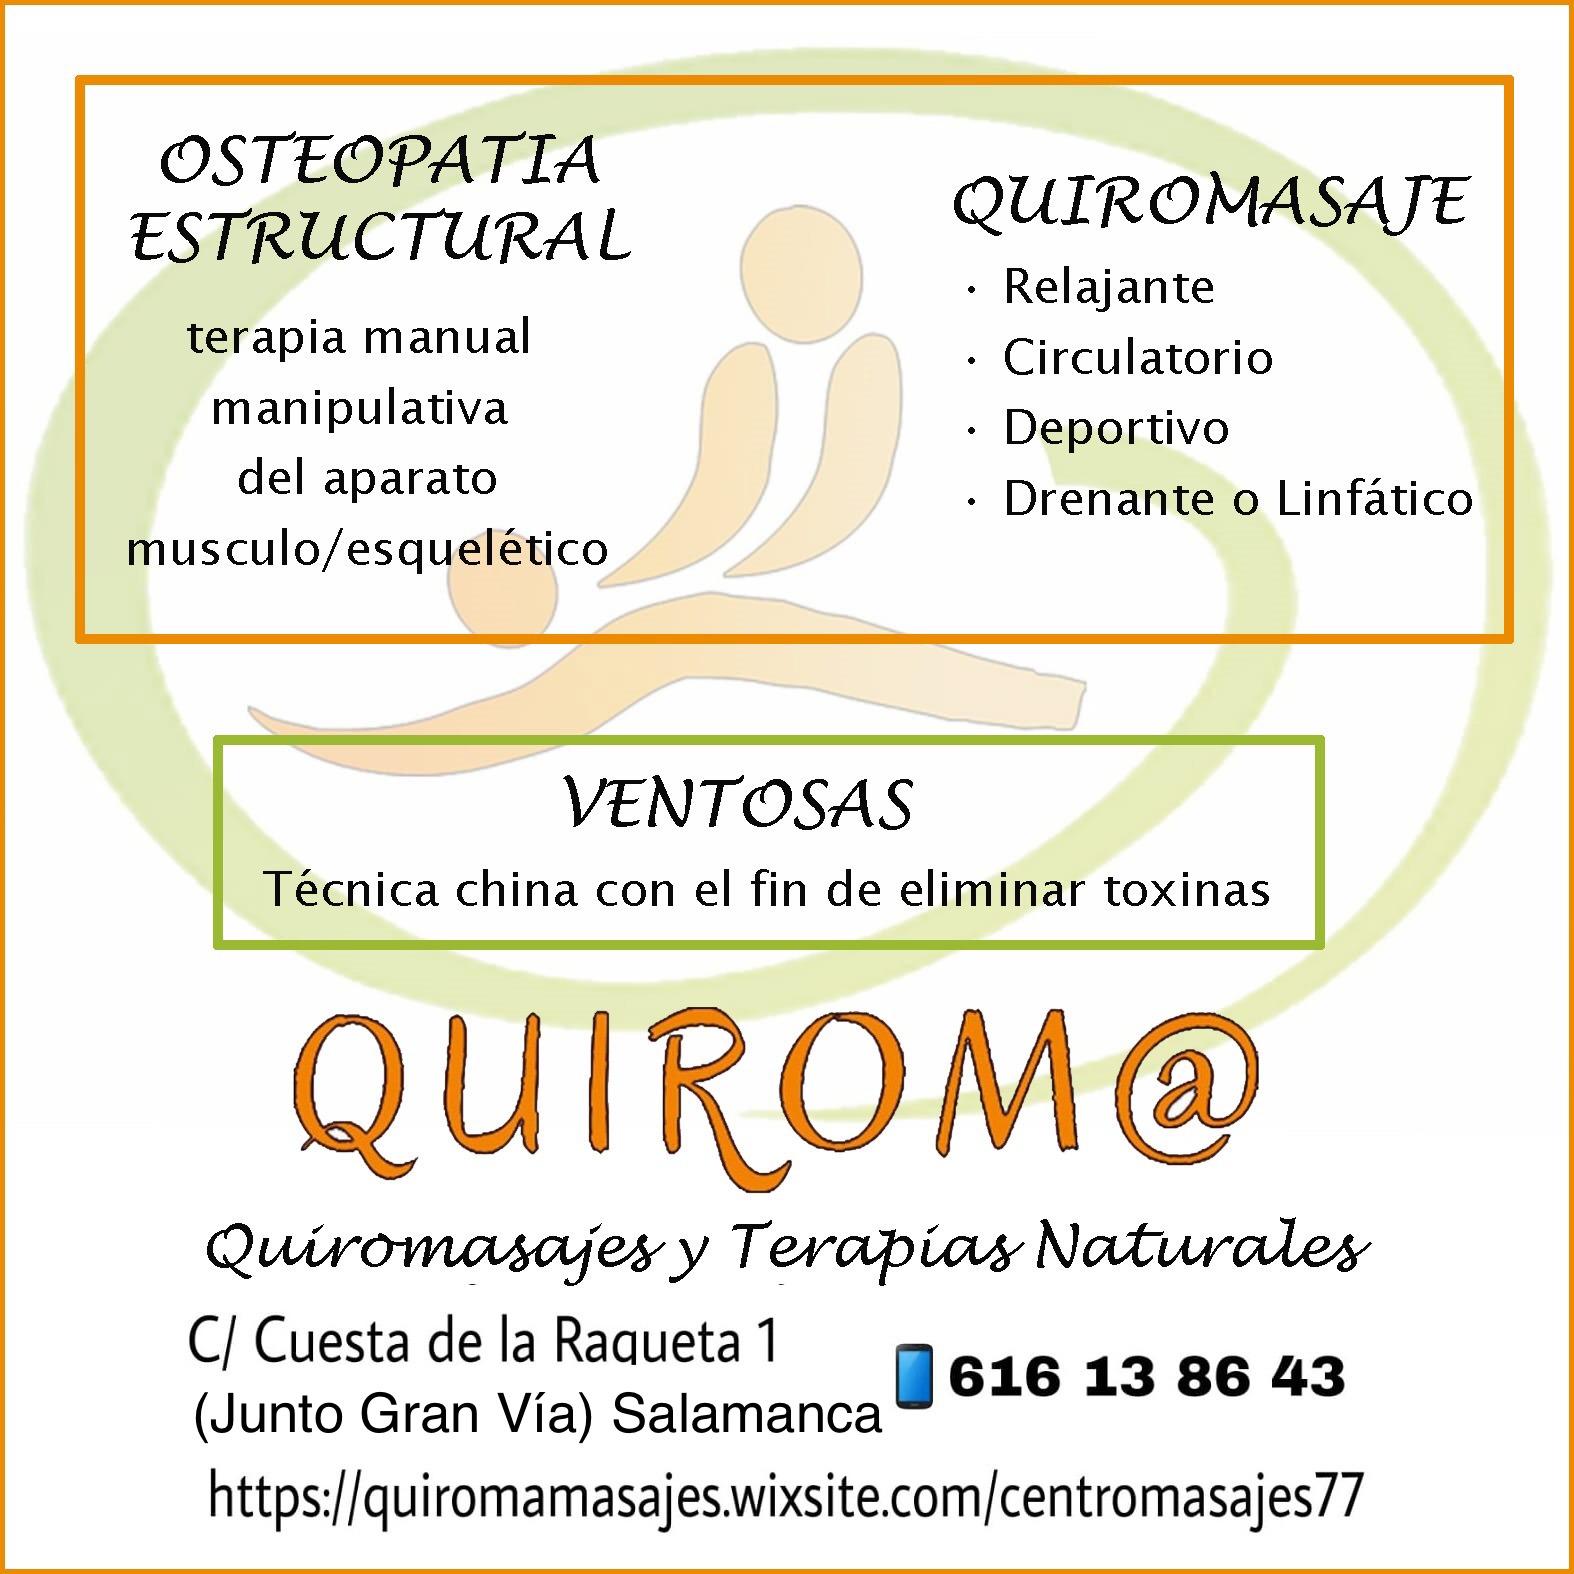 Logo comerç QUIROM@ QUIROMASAJES Y TERAPIAS NATURALES